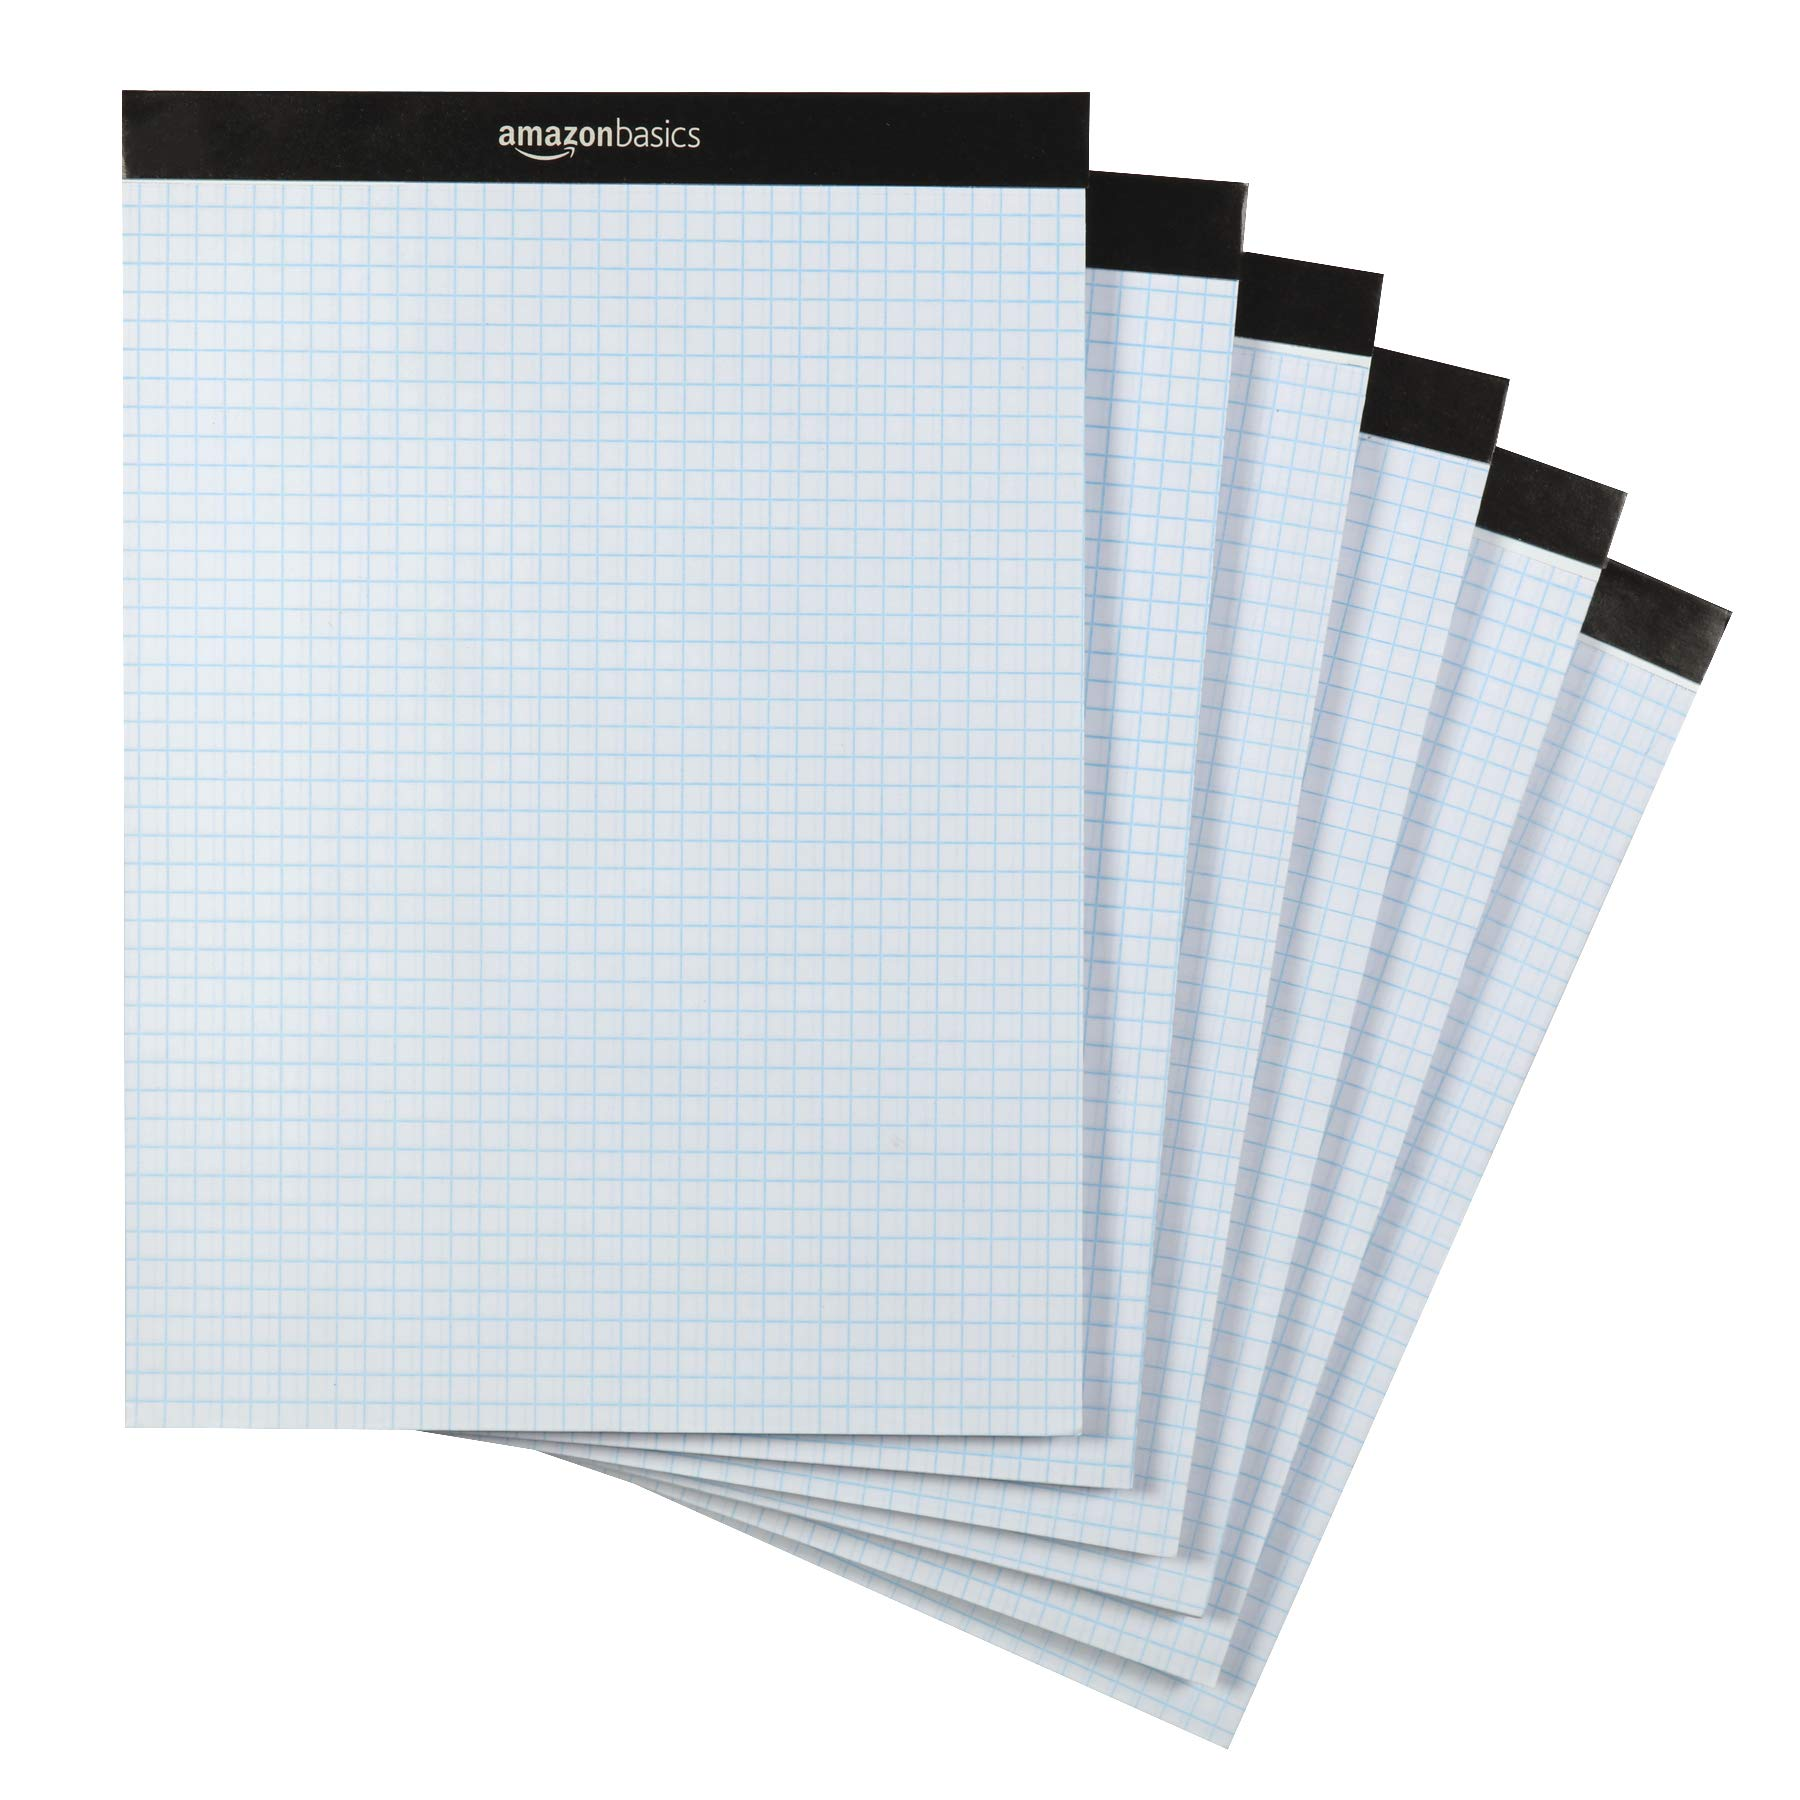 "Amazon Basics Quad Ruled Graph Paper Pad, Letter Size 8.5"" x 11"", 6-Pack"